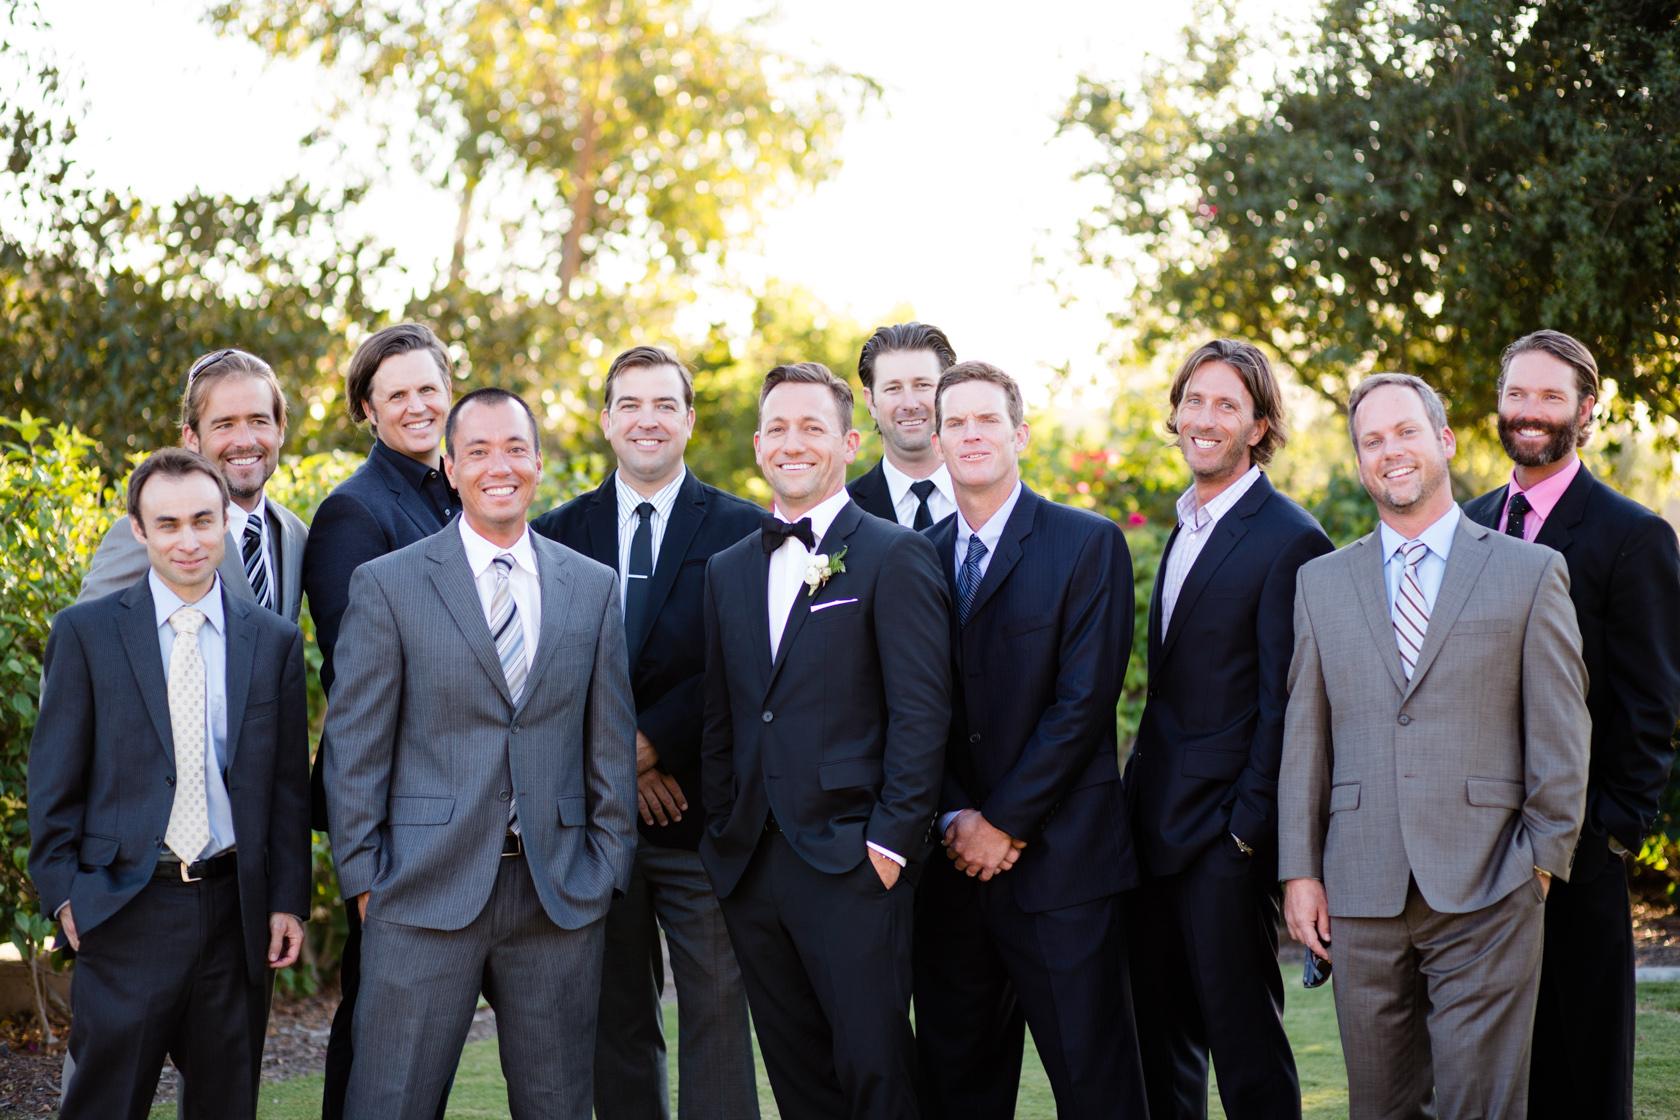 Rancho_Valencia_Resort_Wedding_049.jpg